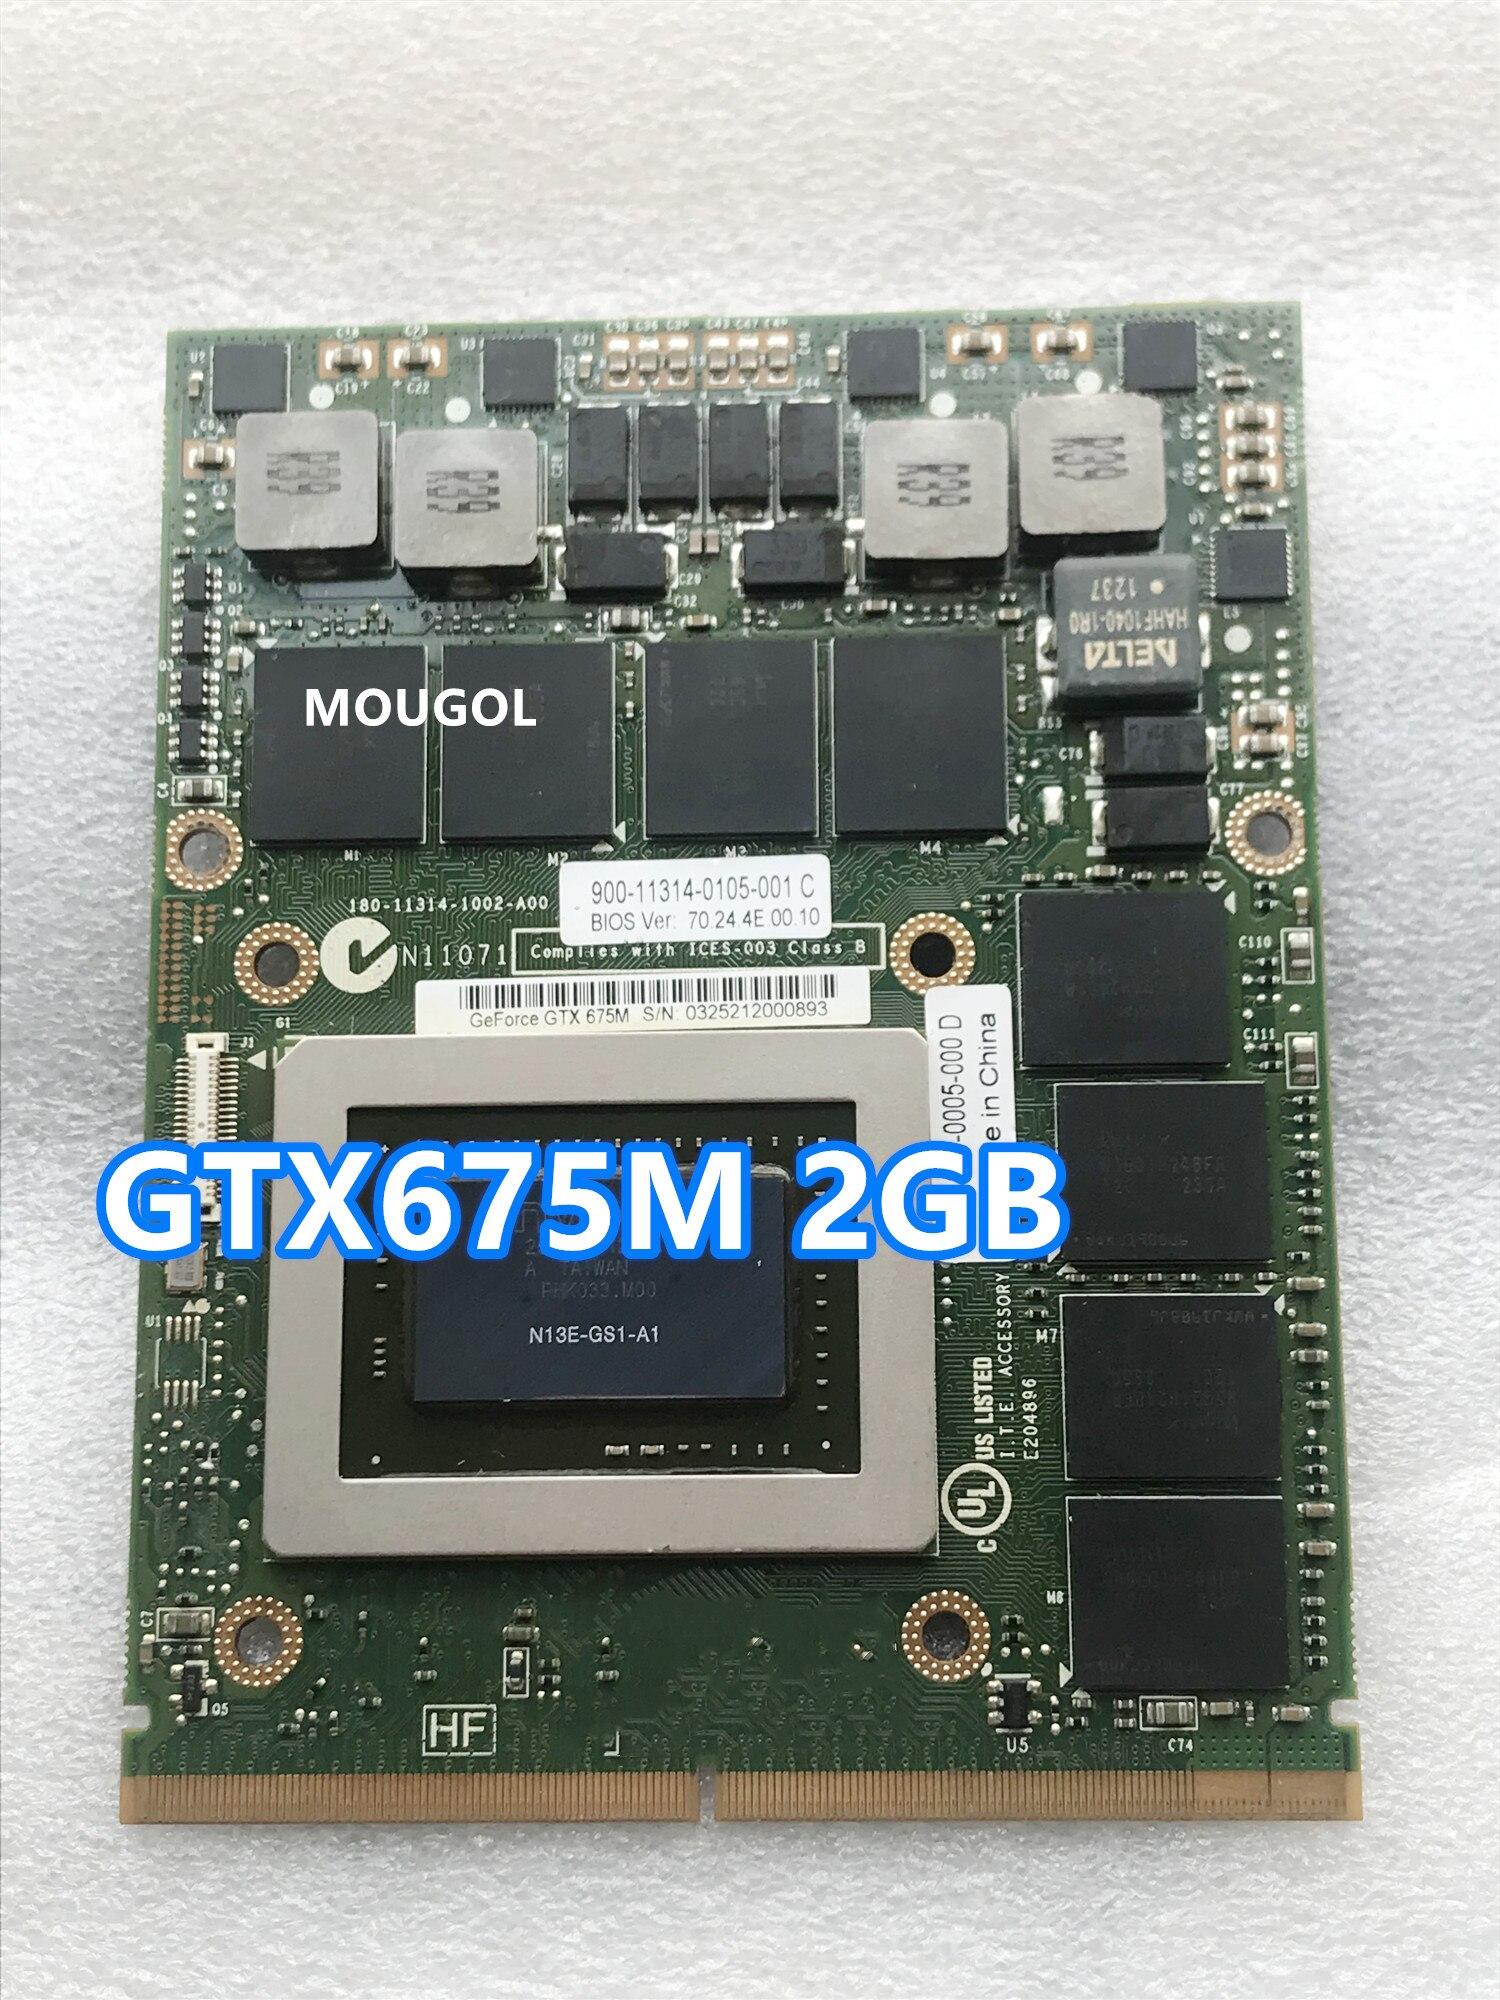 Placa de Vídeo Ddr5 para Laptop Brand Novidades Vga Gráficos 7w4gt Dell M6000 M6600 M6700 M6800 M15x M17x r2 r3 r4 Gtx675m Gtx 675m